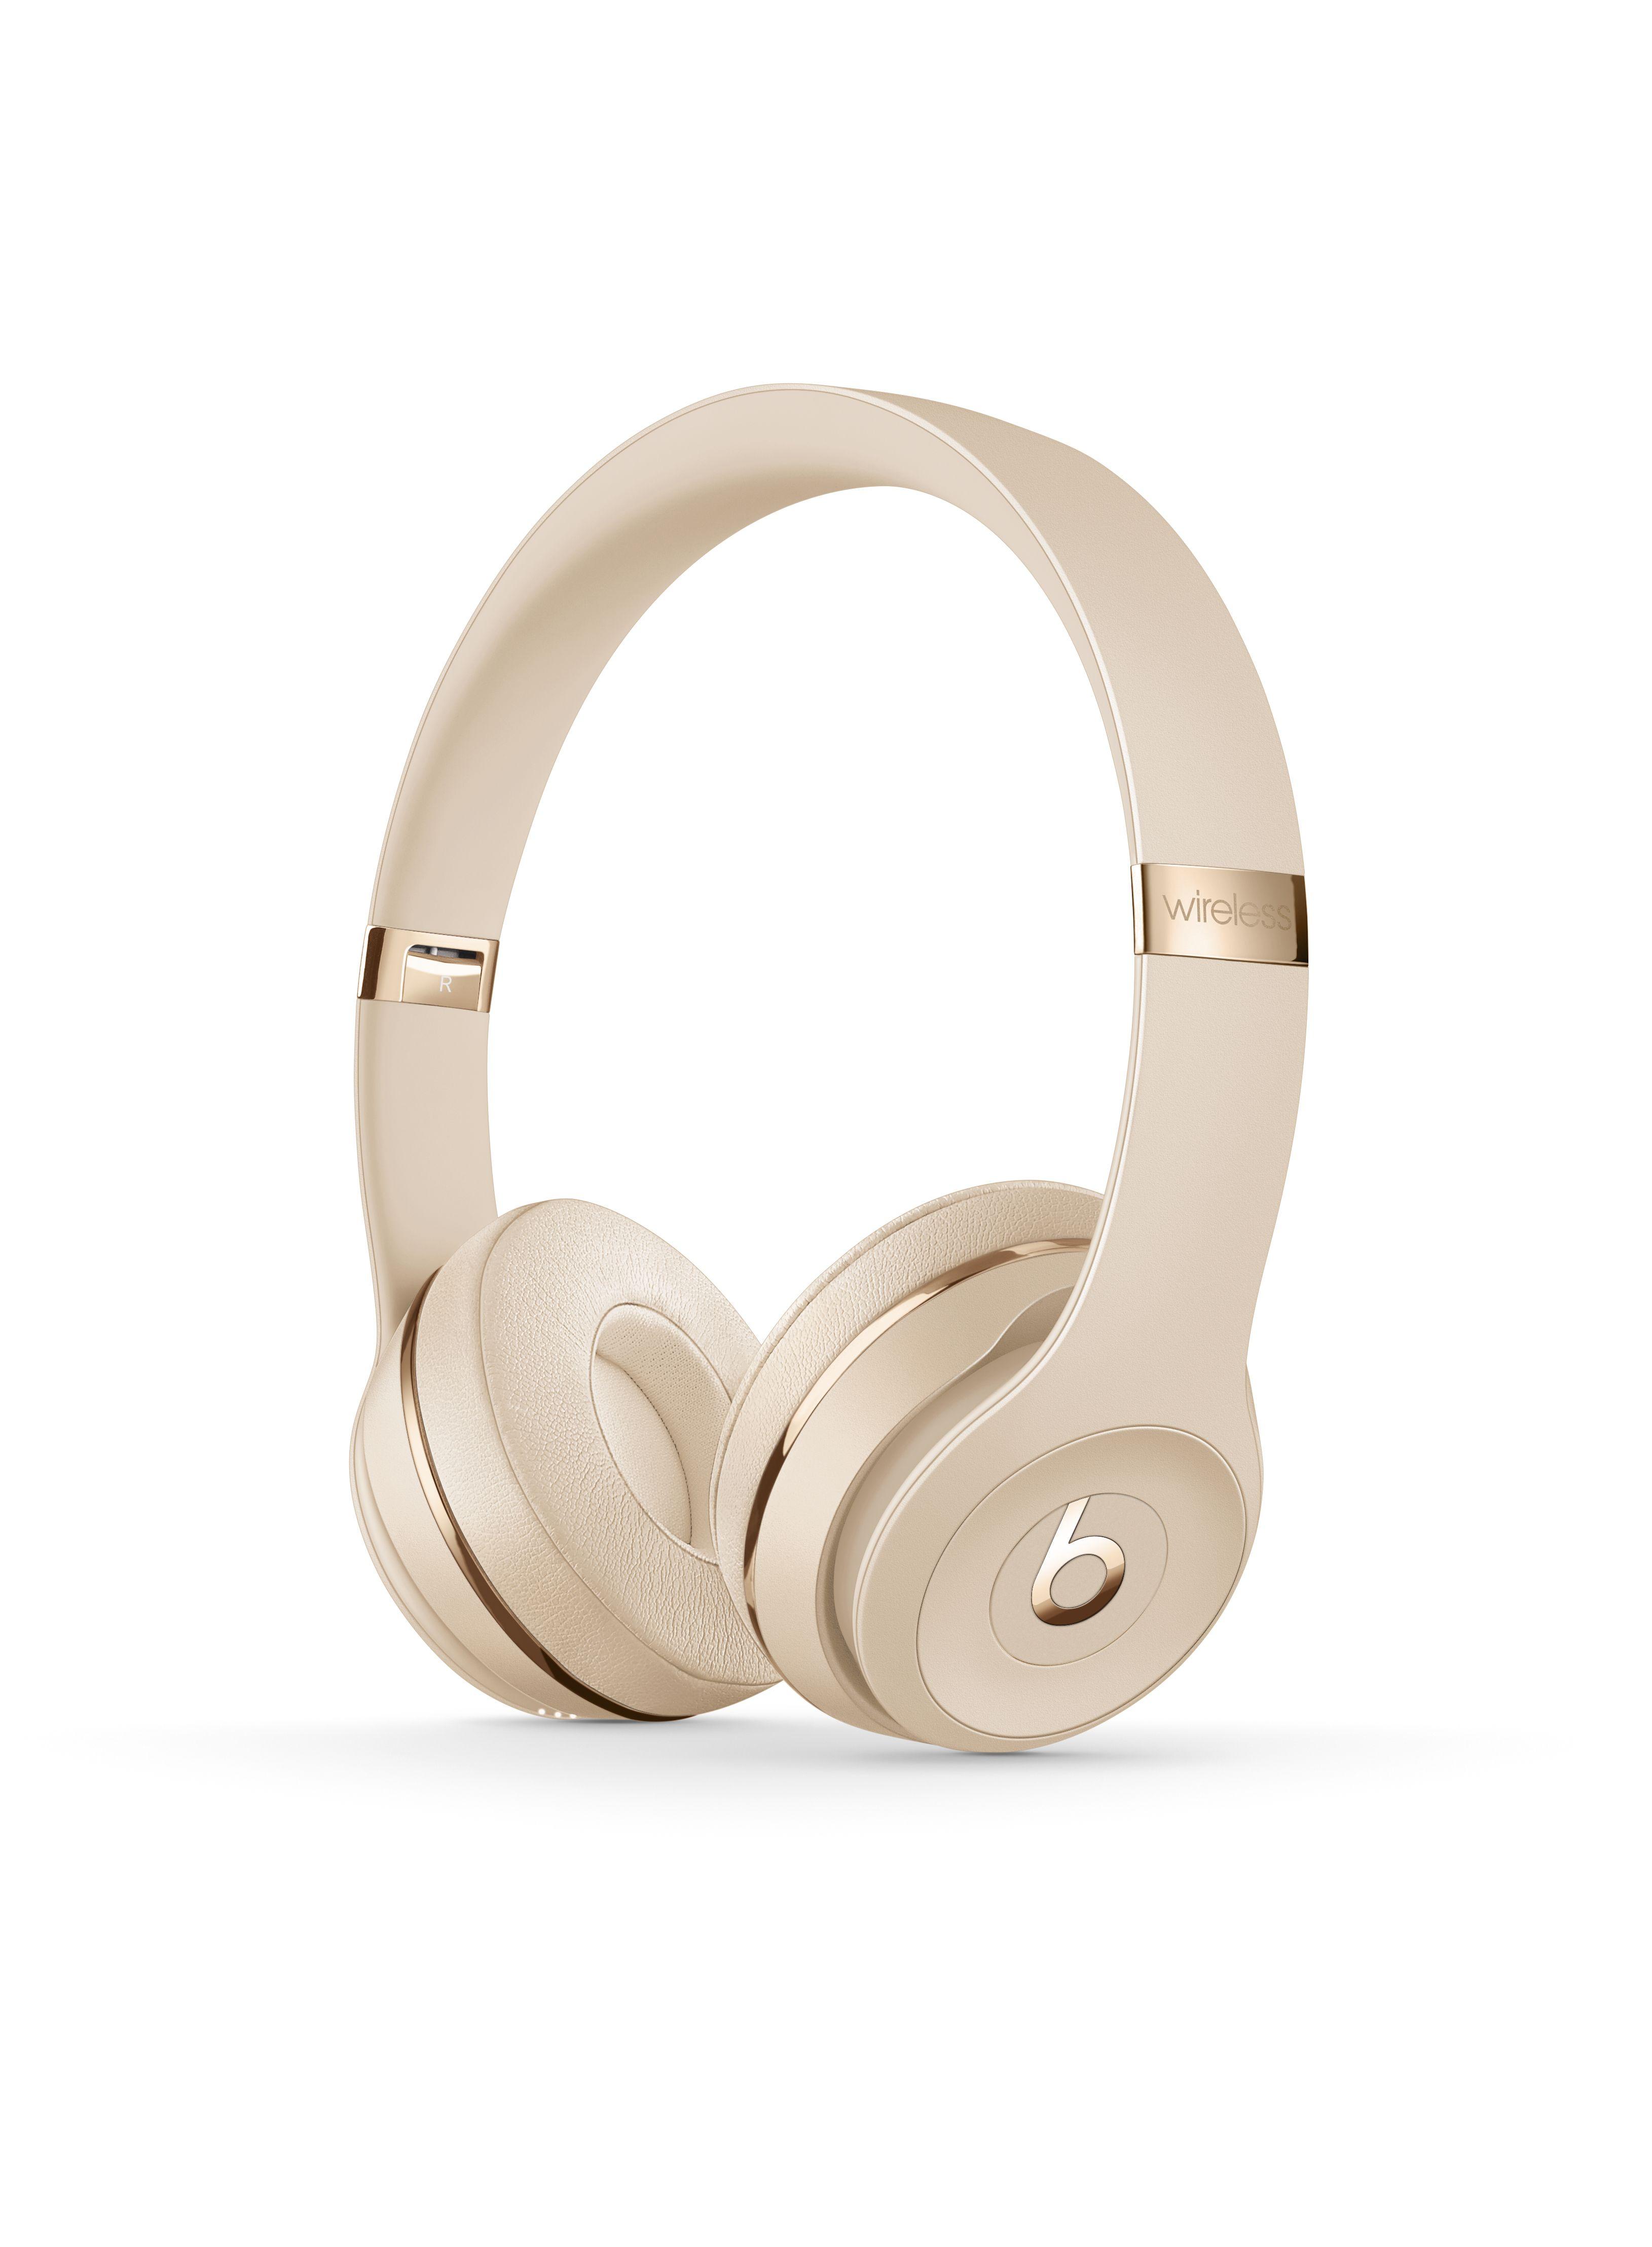 Pin By Lauren Anne On Wanted Cuties In 2020 Wireless Headphones Headphones Wireless Beats